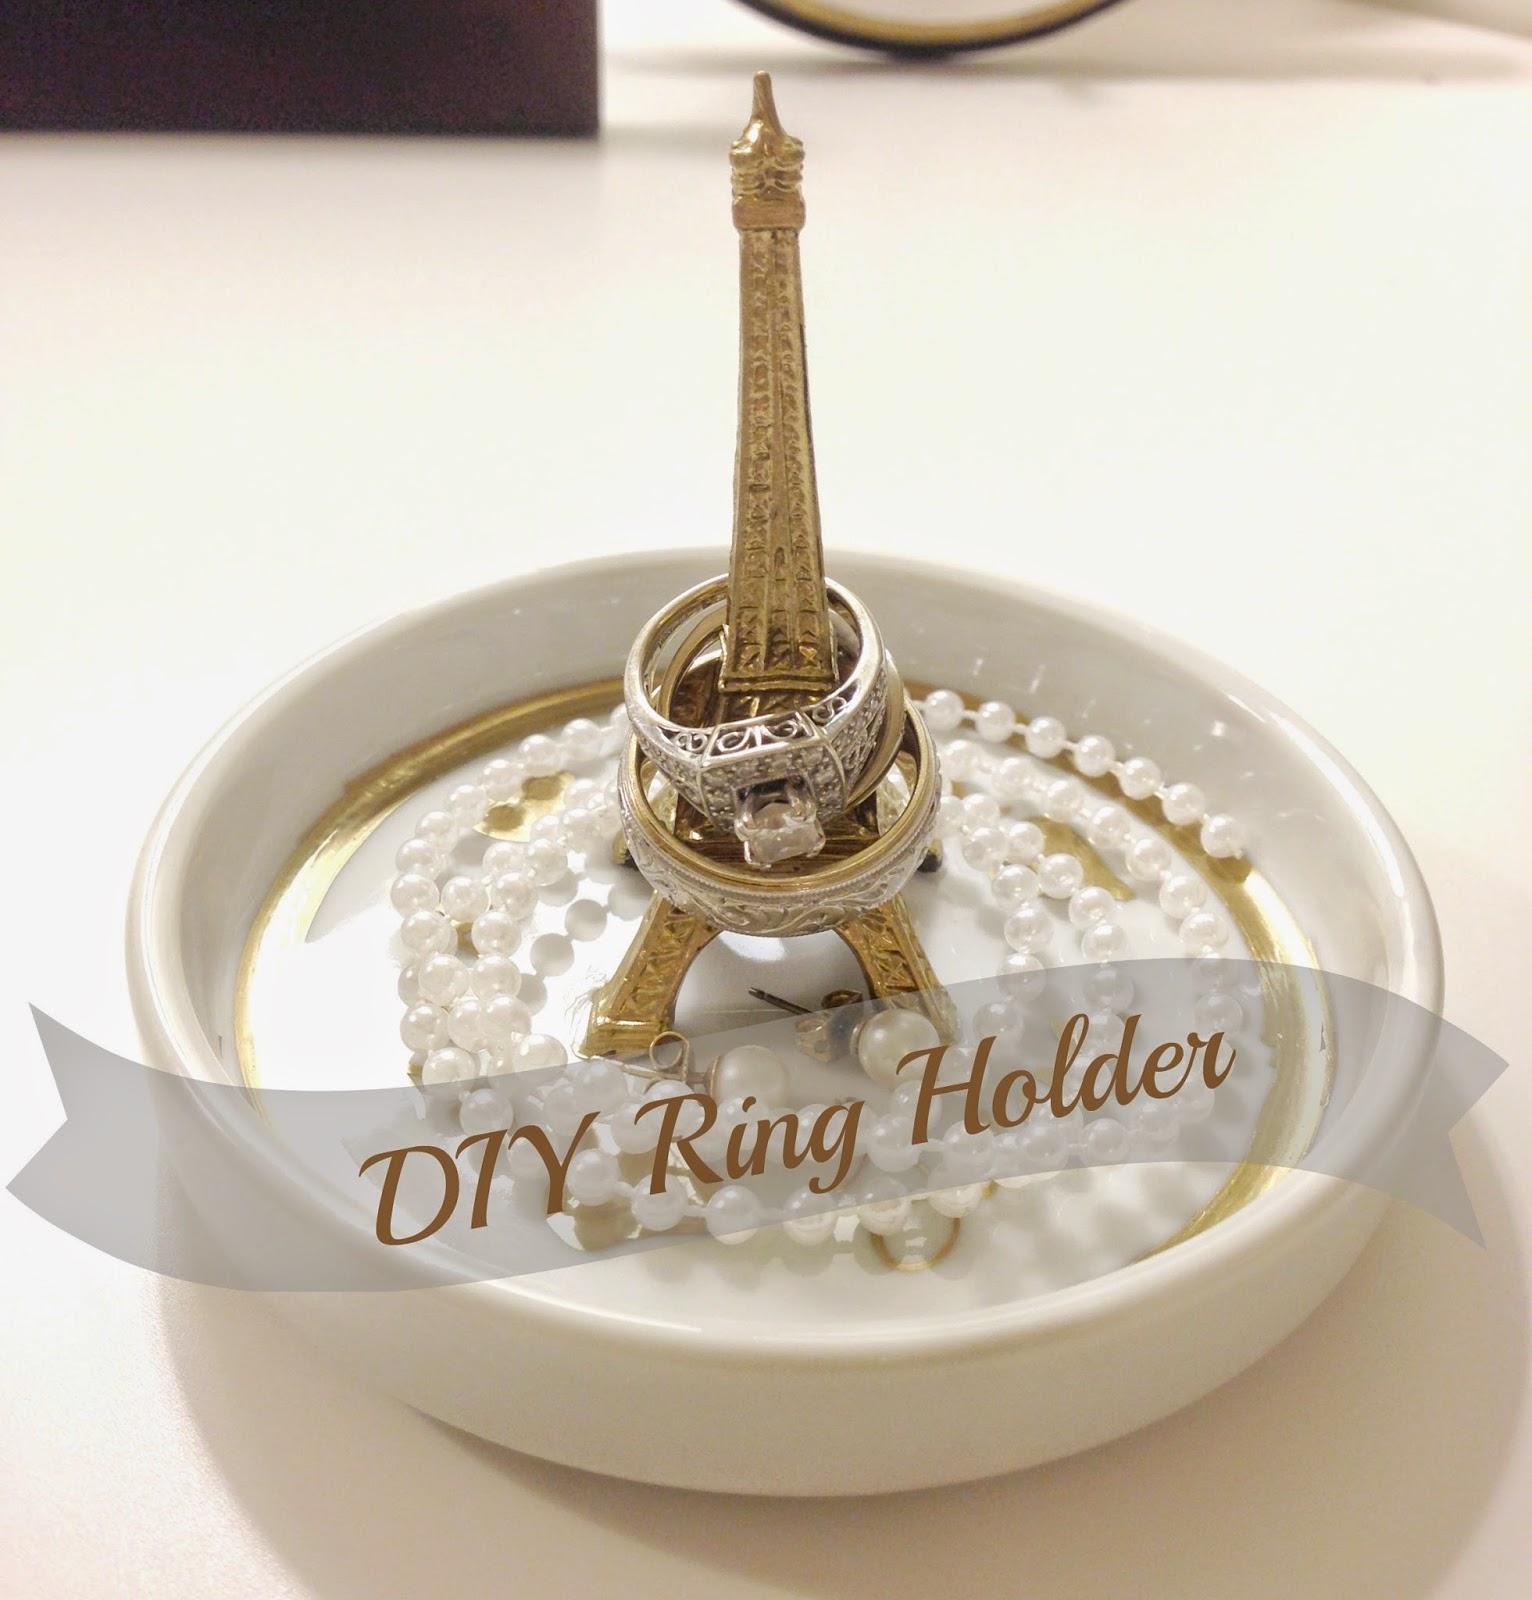 A Little Bolt of Life: DIY Ring Holder